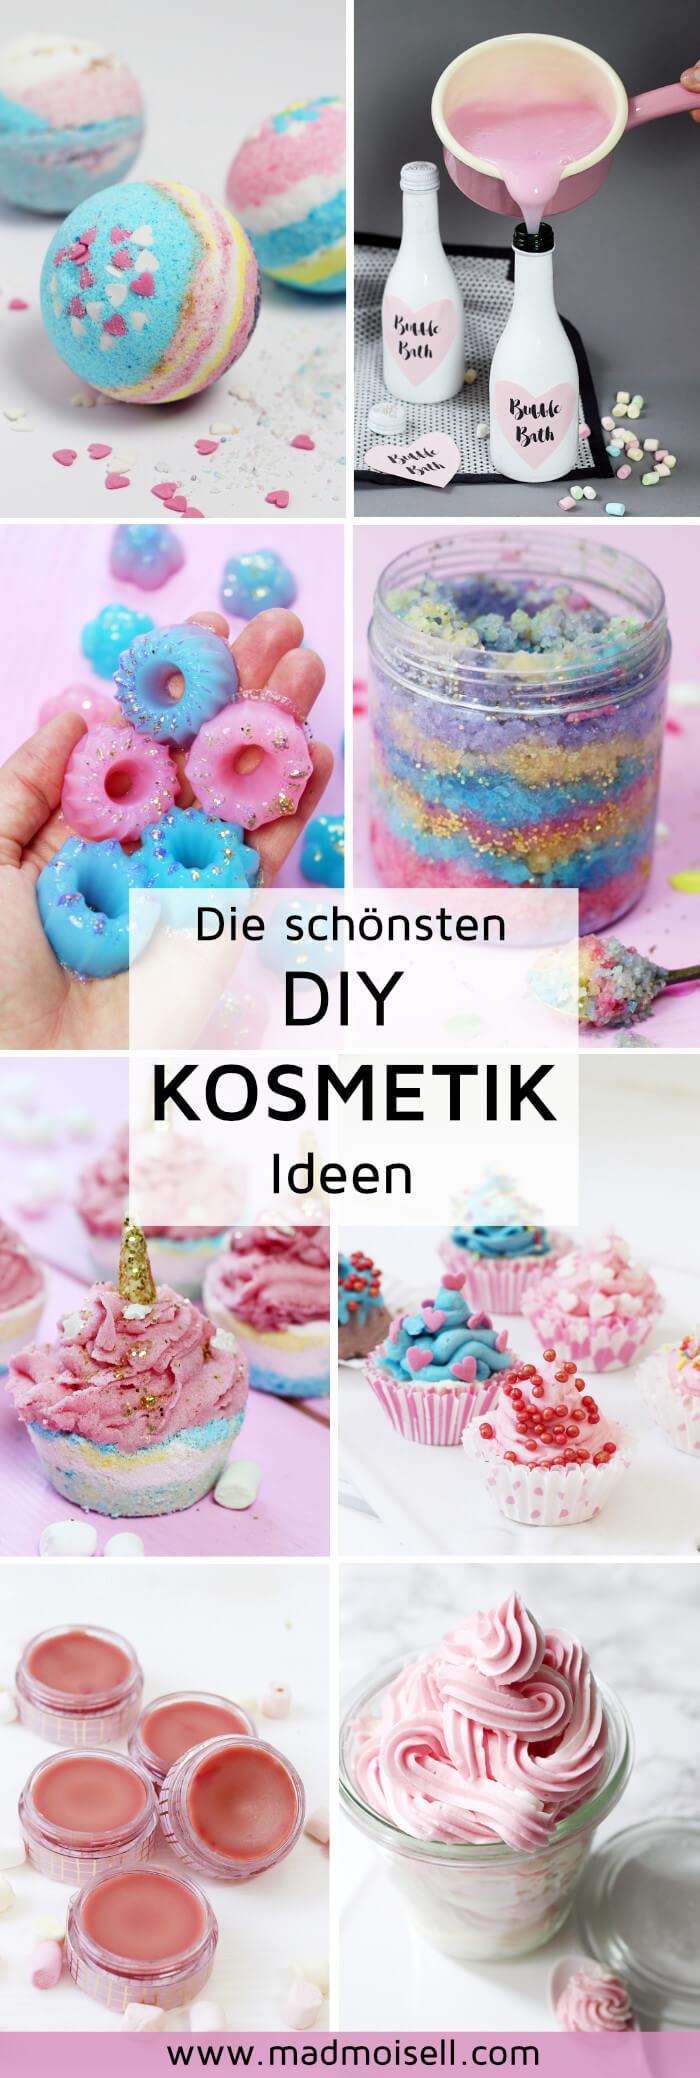 DIY Idee 1): DIY Lippenbalsam Selber Machen